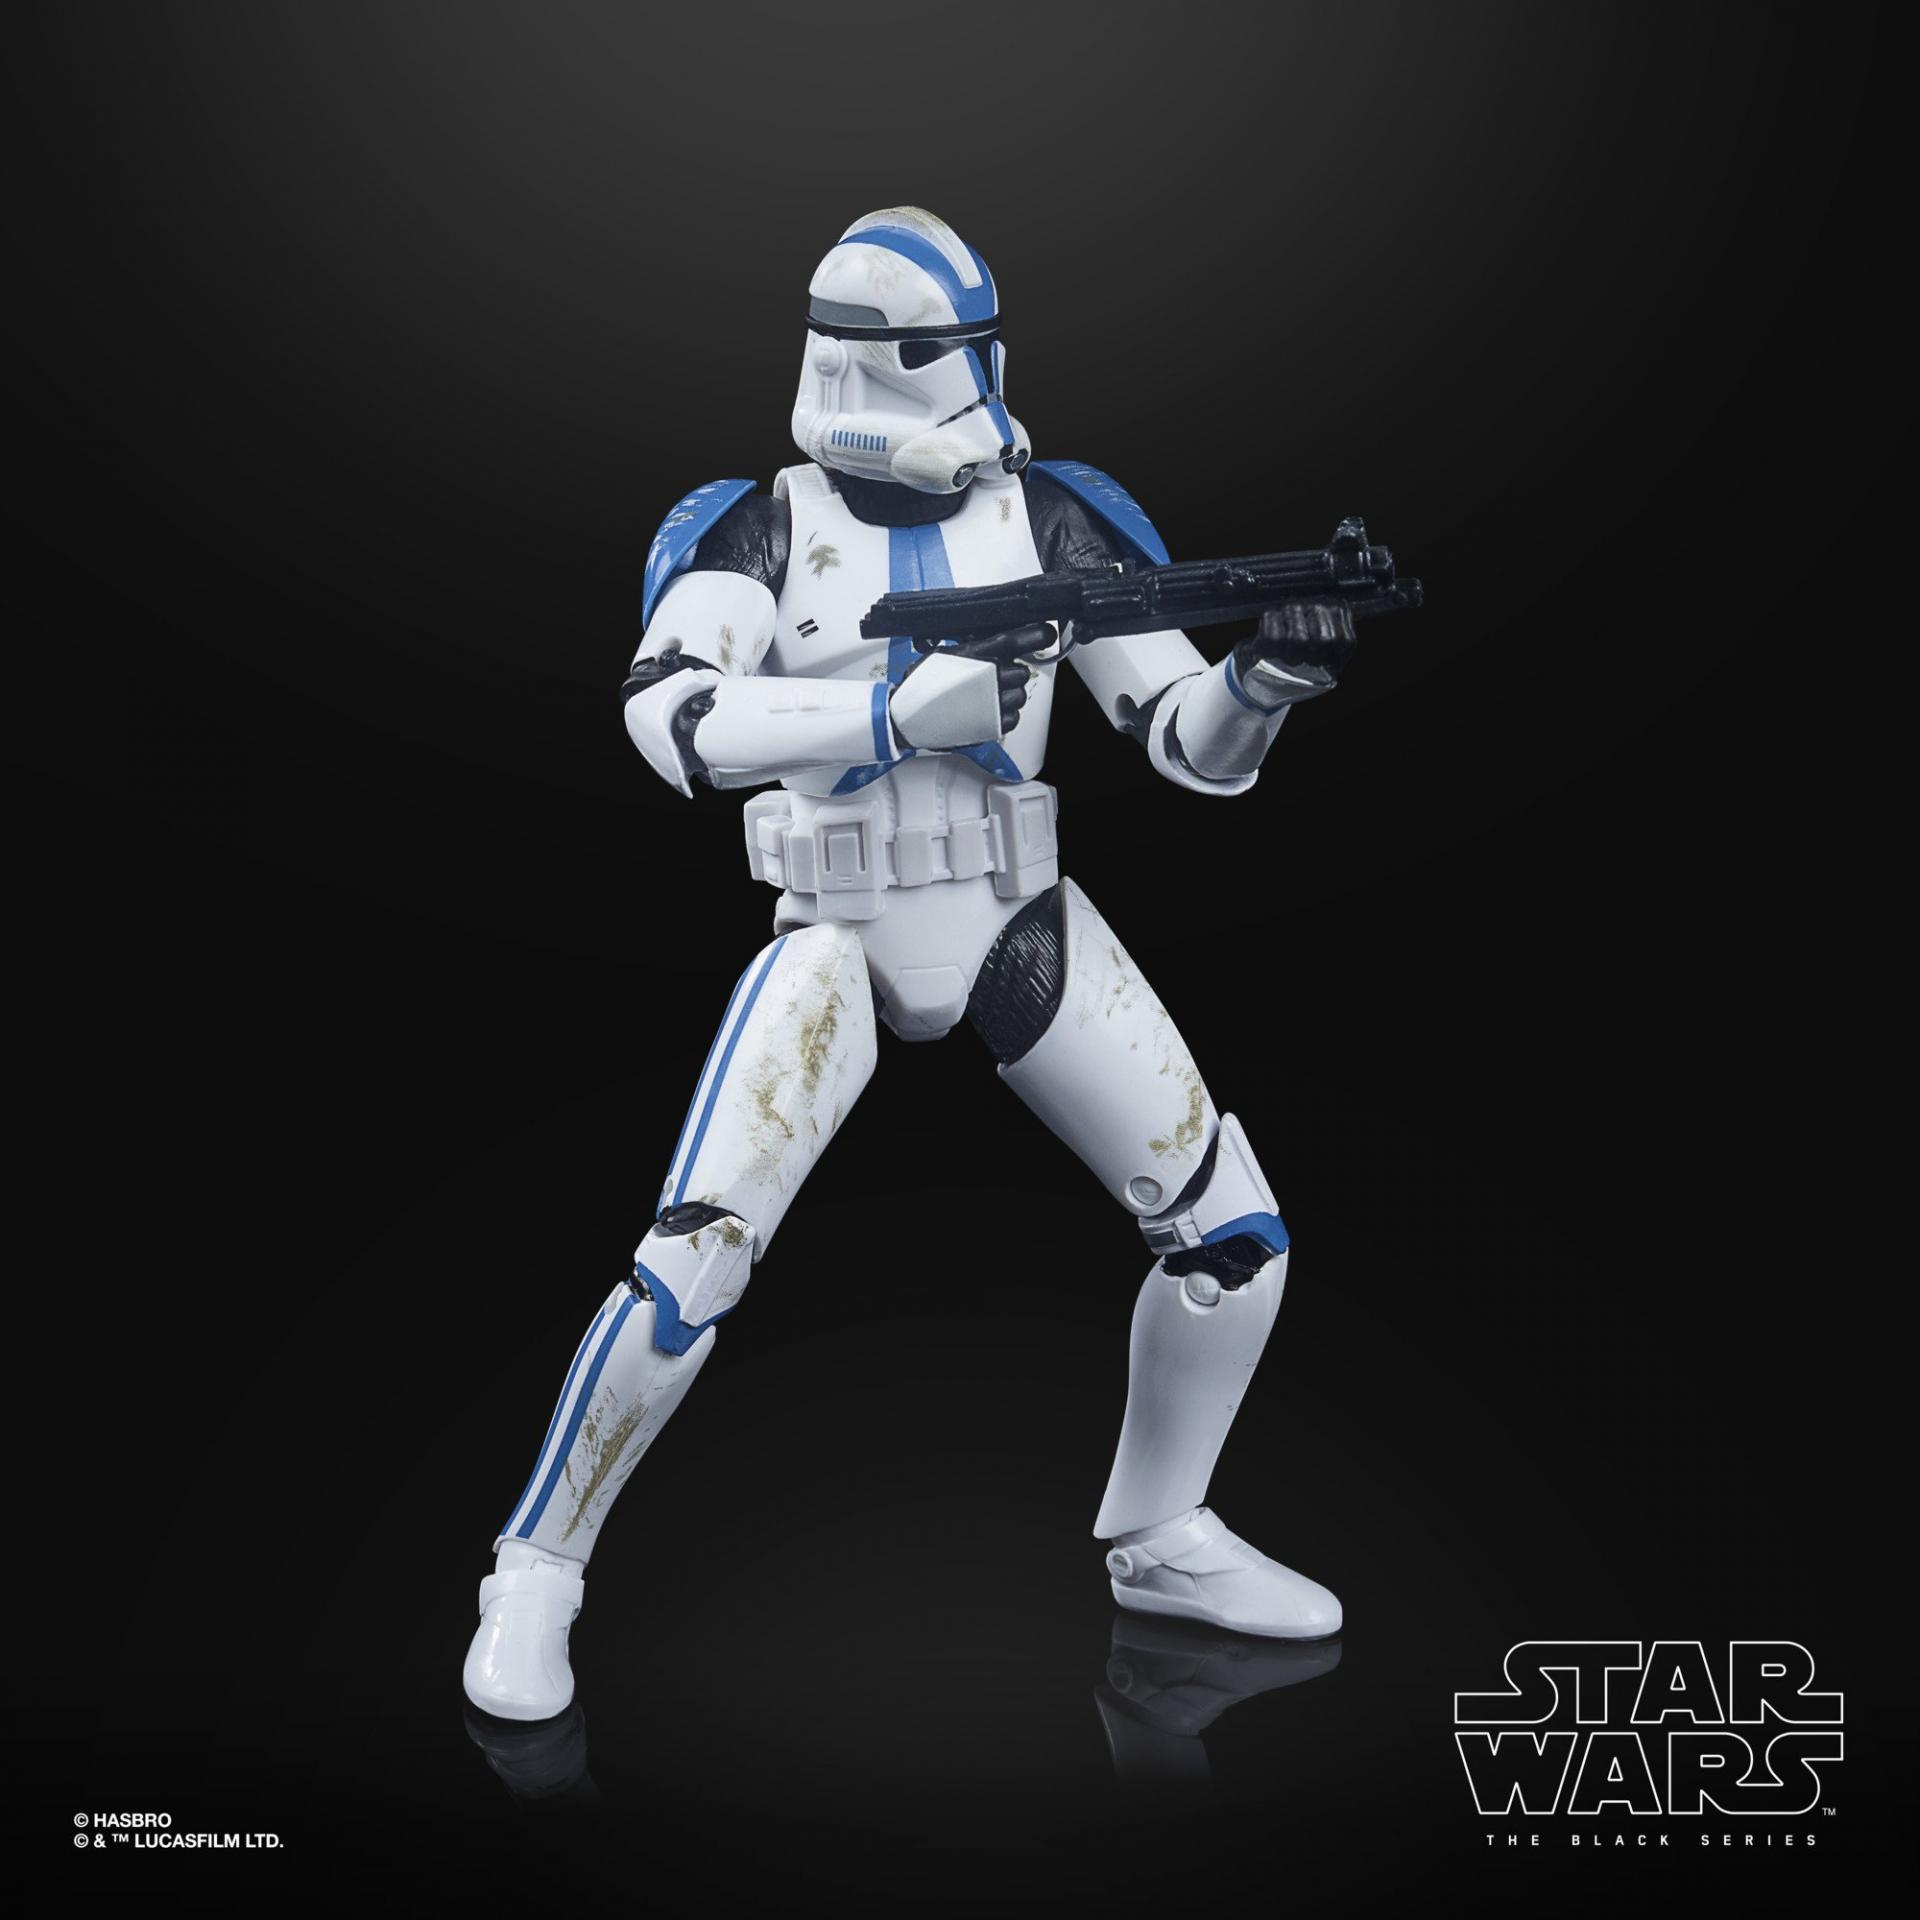 Star wars the black series archive 501st legion clone trooper 15cm4